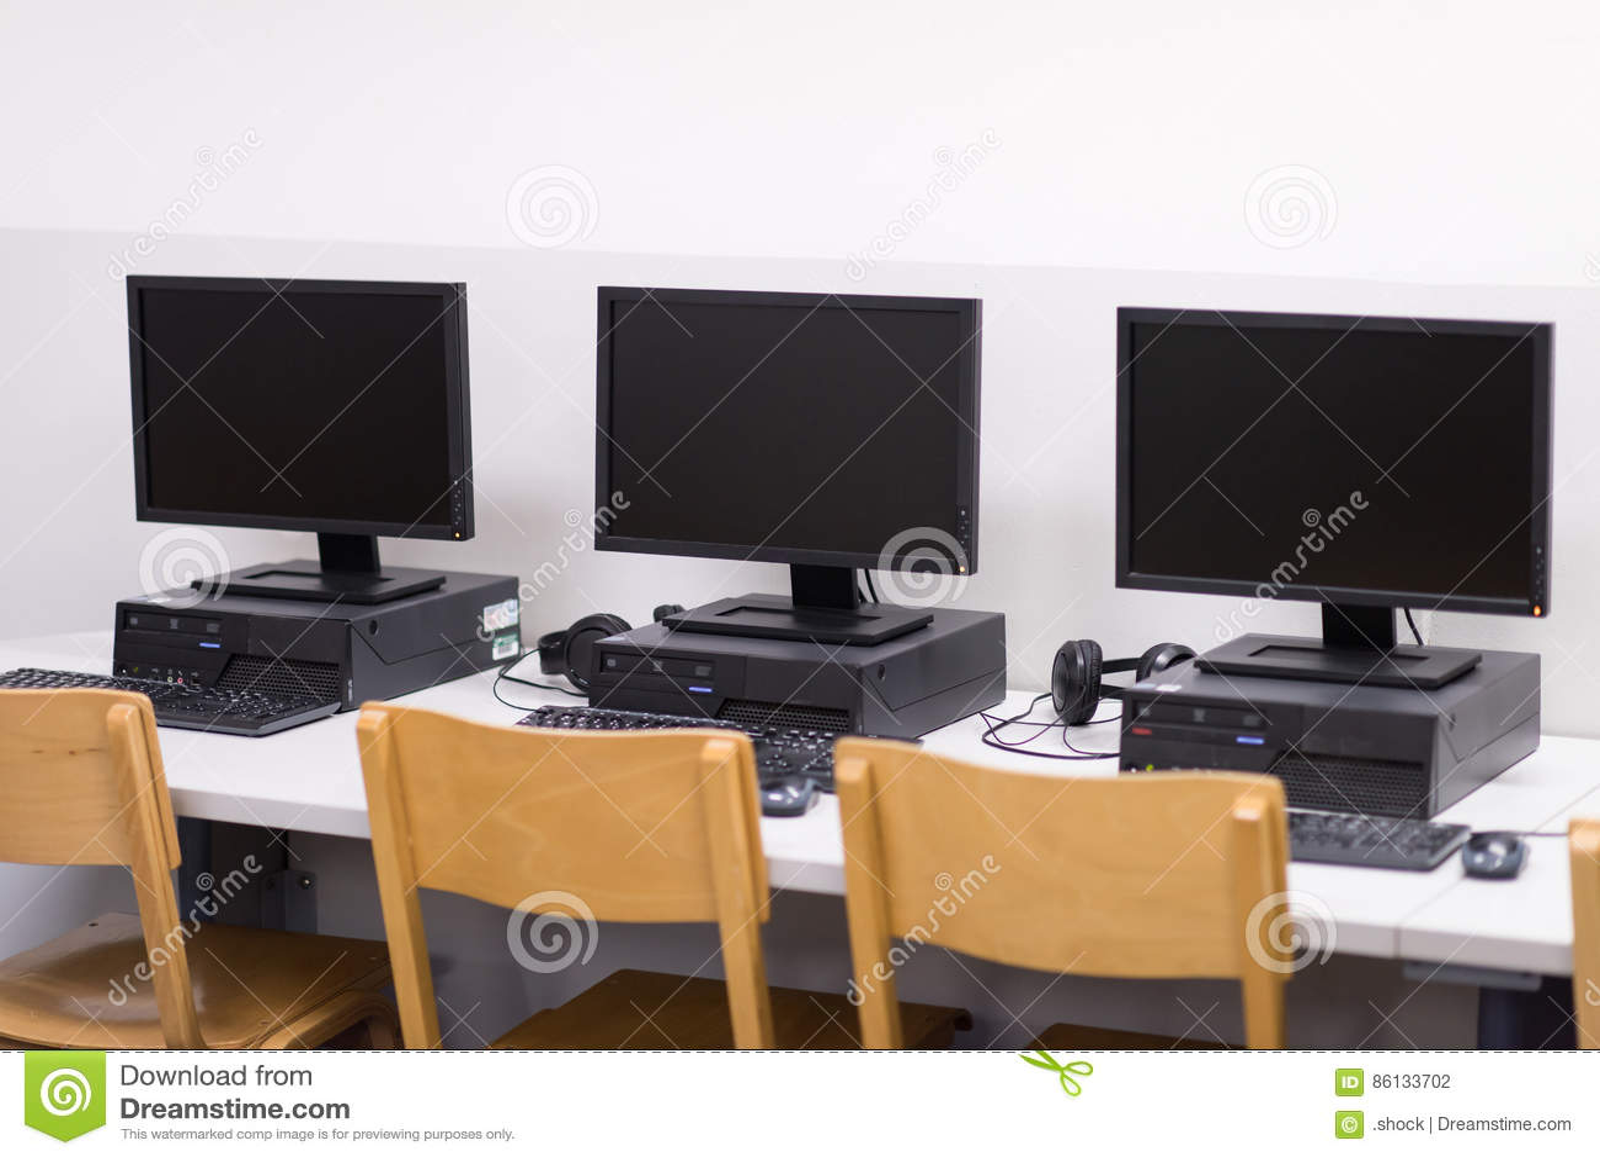 Computer classroom stock photo. Image of futuristic, college ...